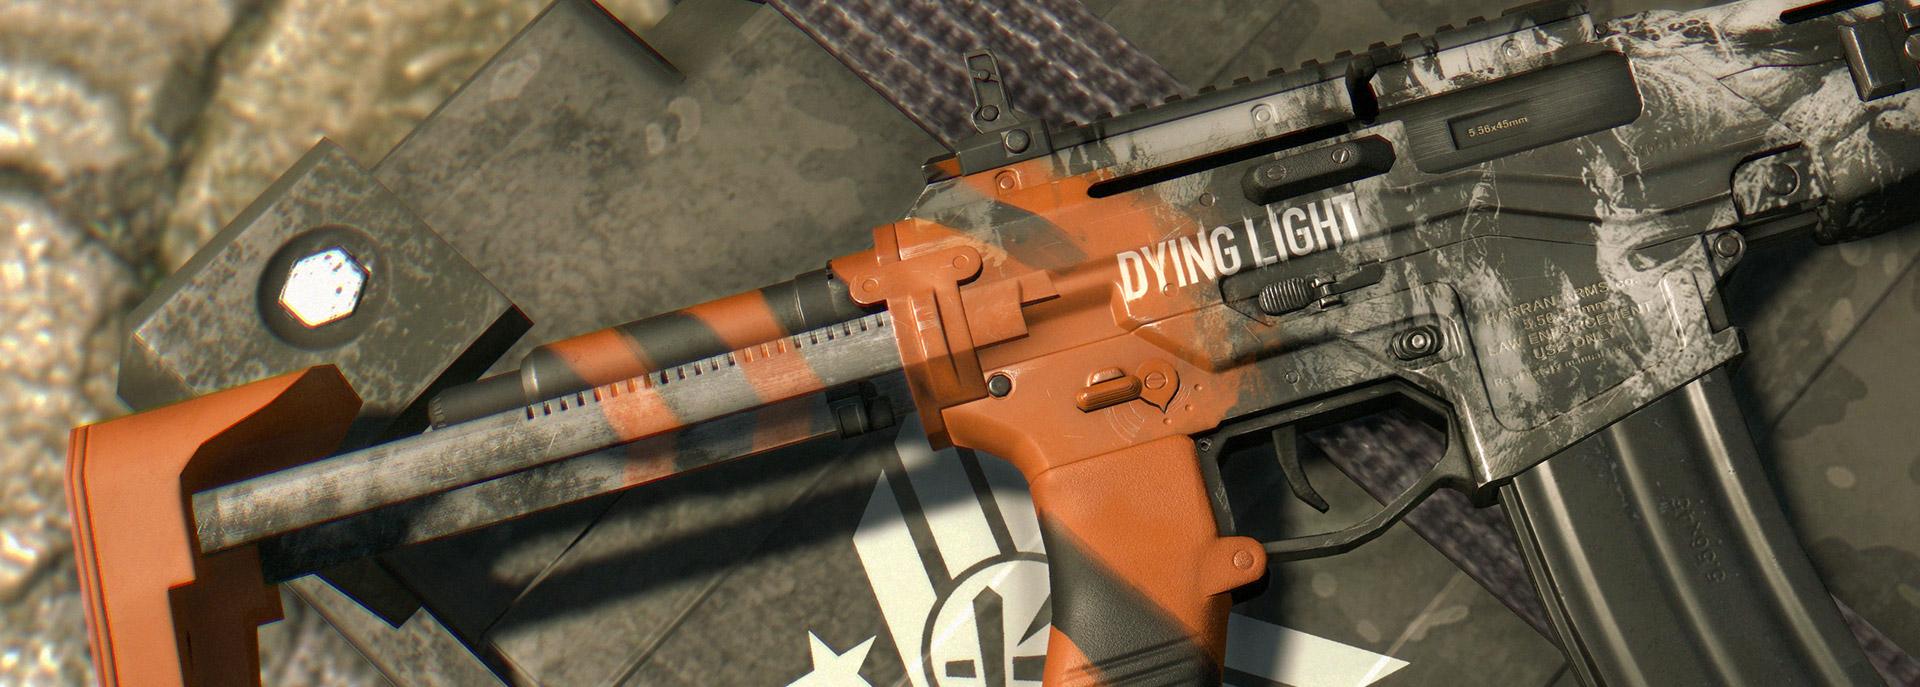 Dying Light - Harran Military Rifle (Free DLC) - Steam or GOG - $0.00